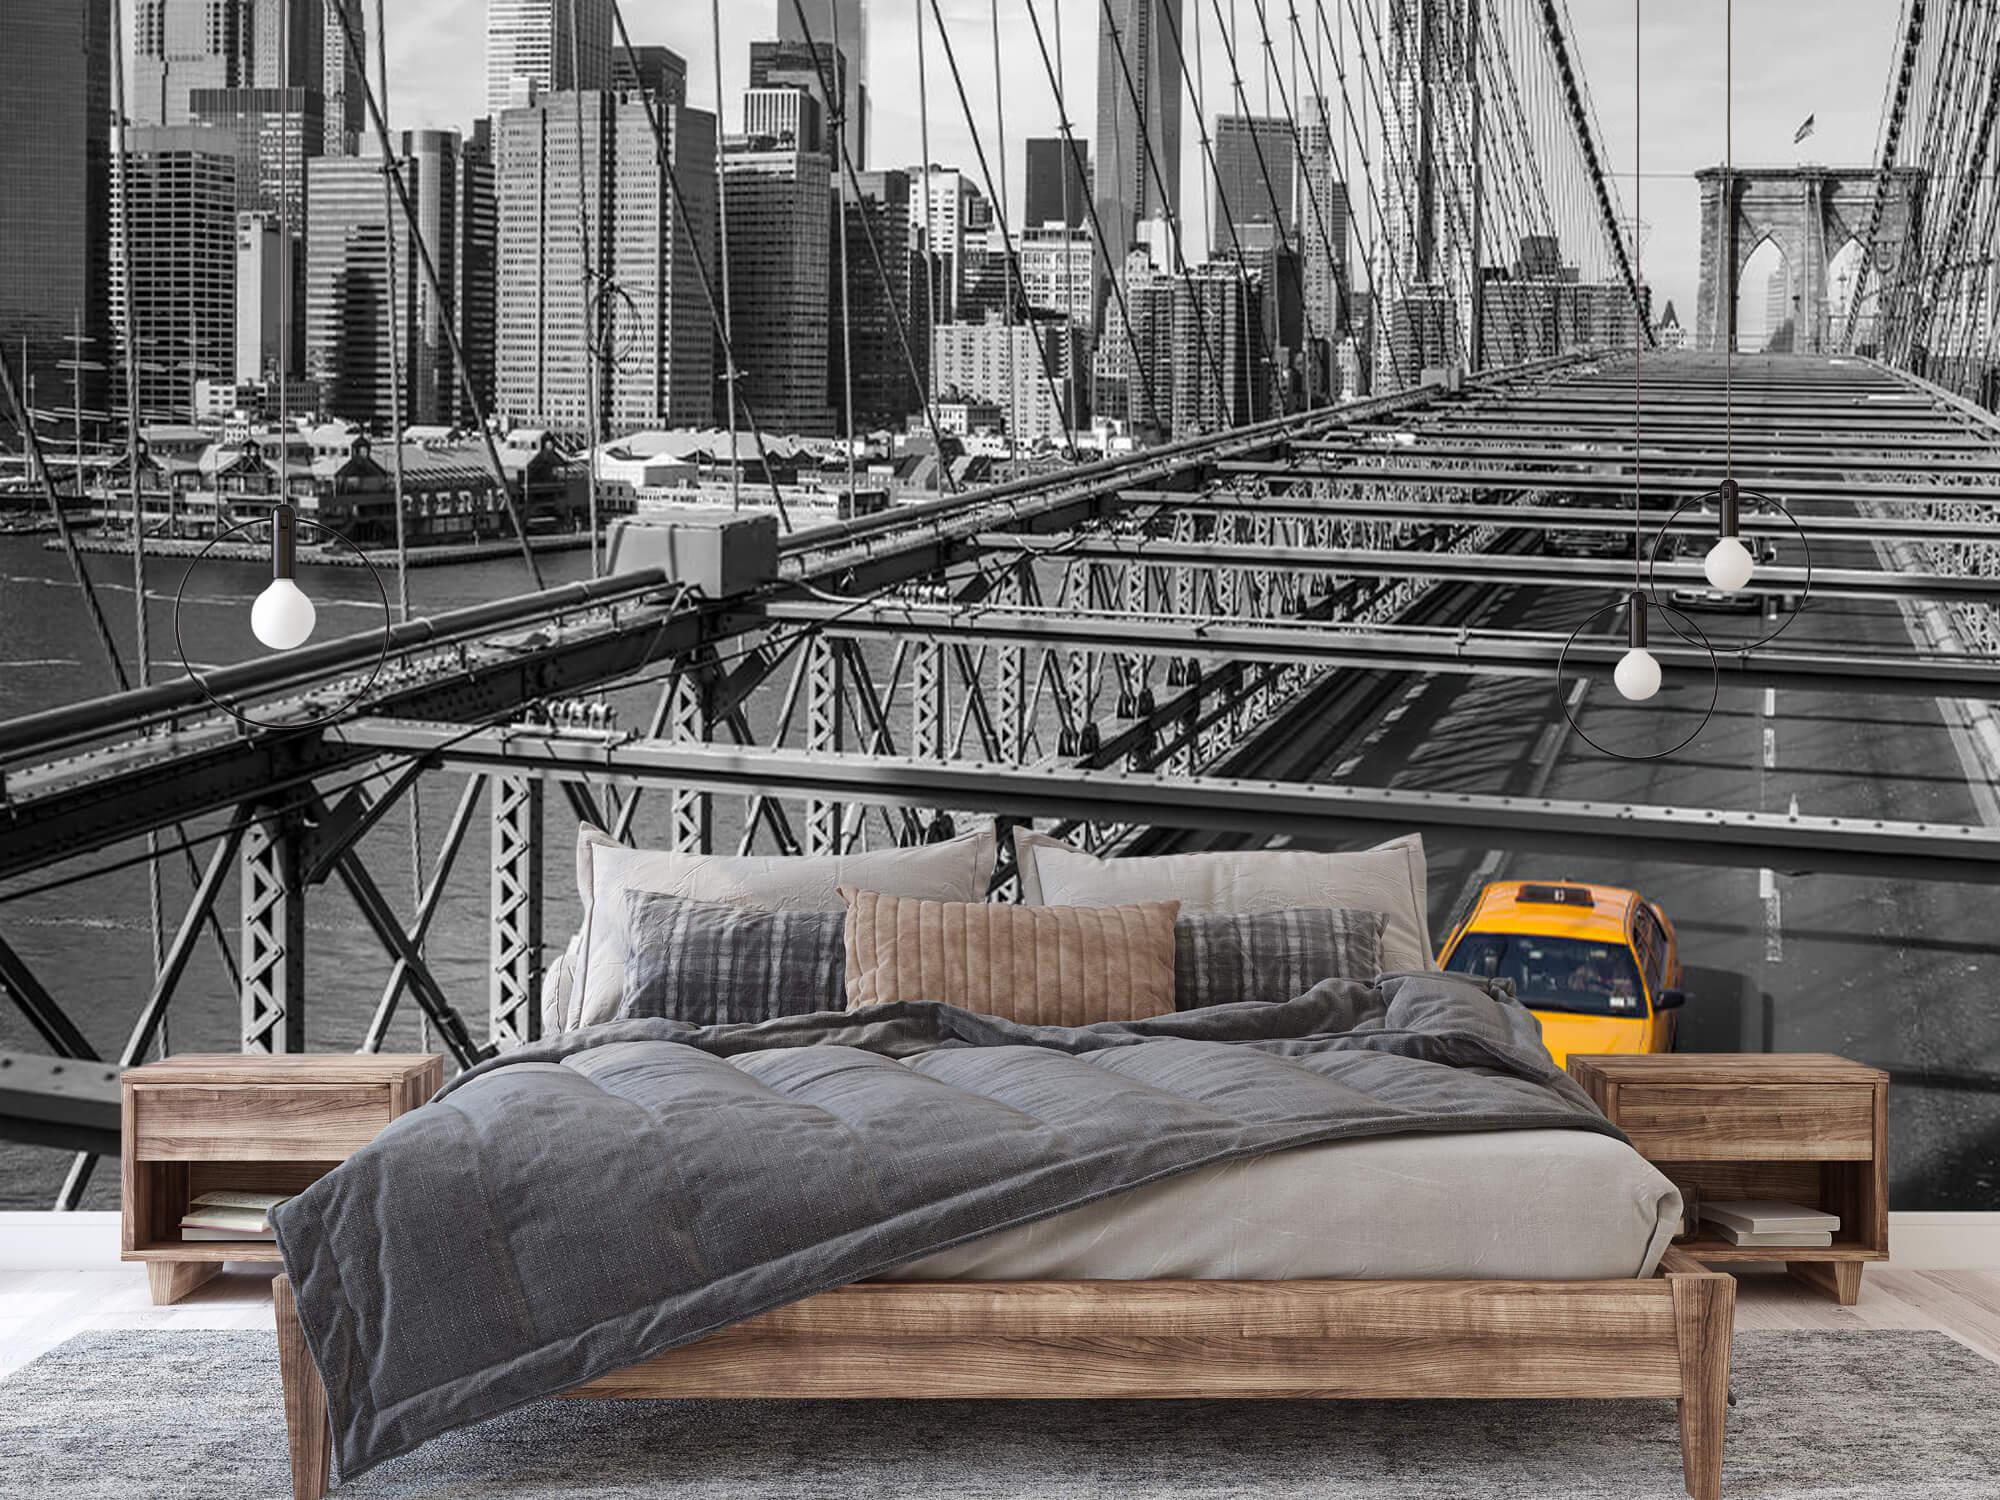 En taxi över Brooklyn Bridge 5